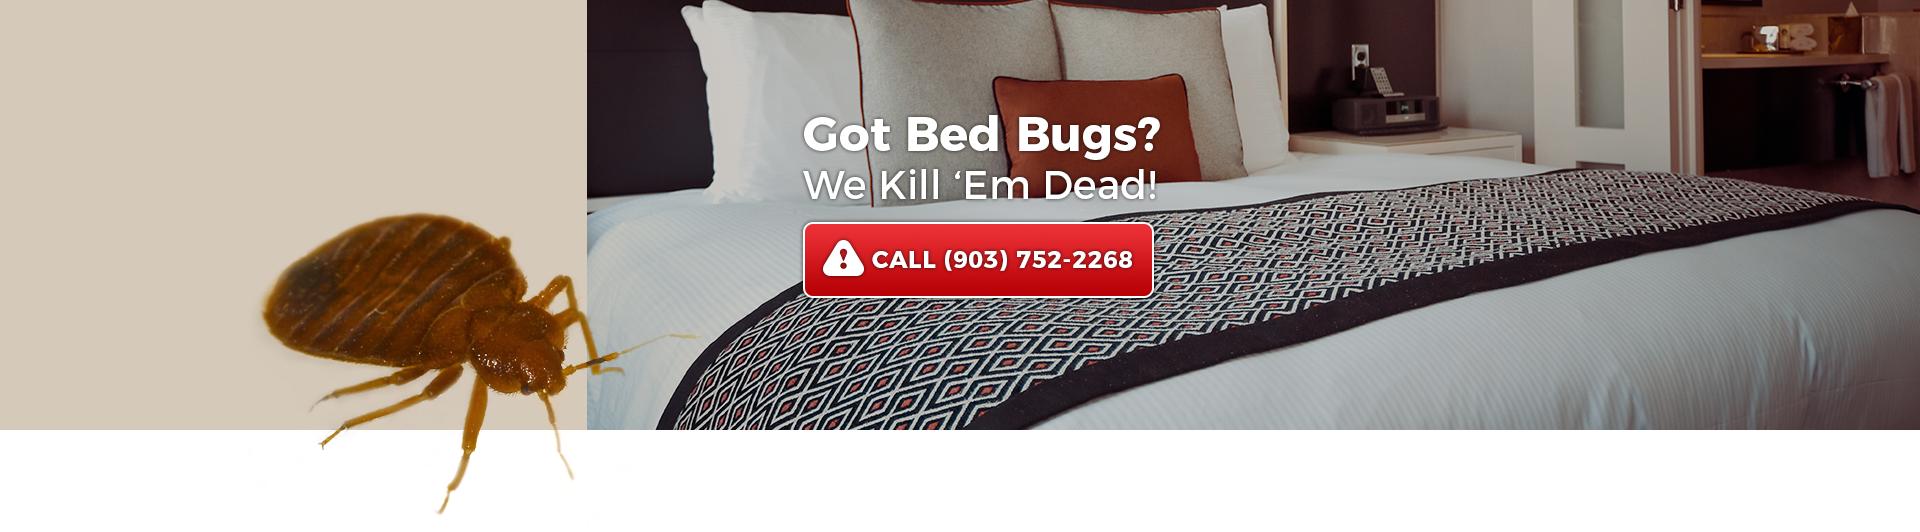 Got Bed Bugs? We Kill 'em Dead